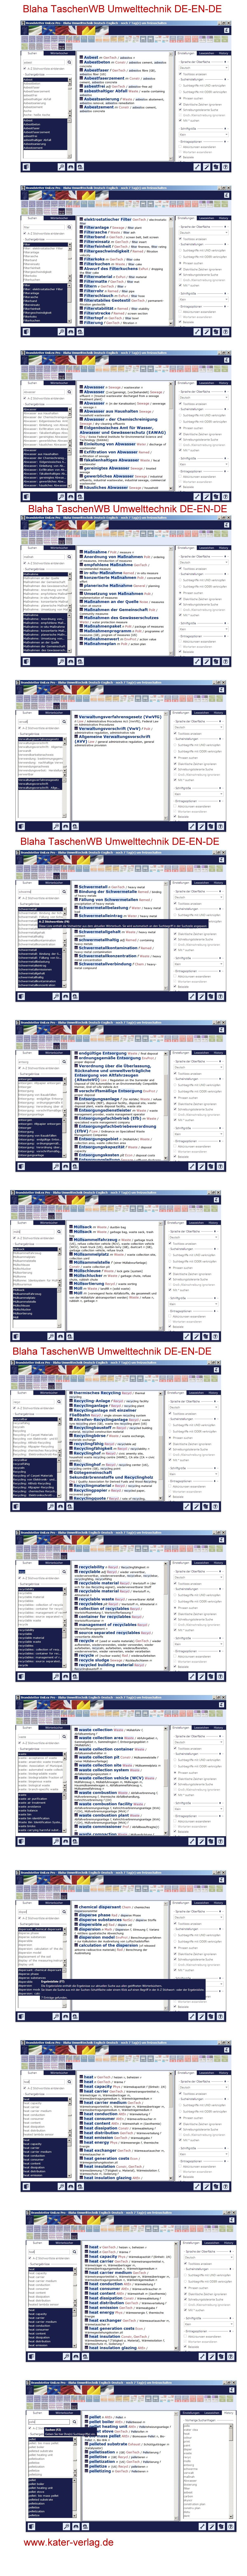 Blaha: Taschenwörterbuch der Umwelttechnik Englisch DE-EN, EN-DE DOWNLOAD